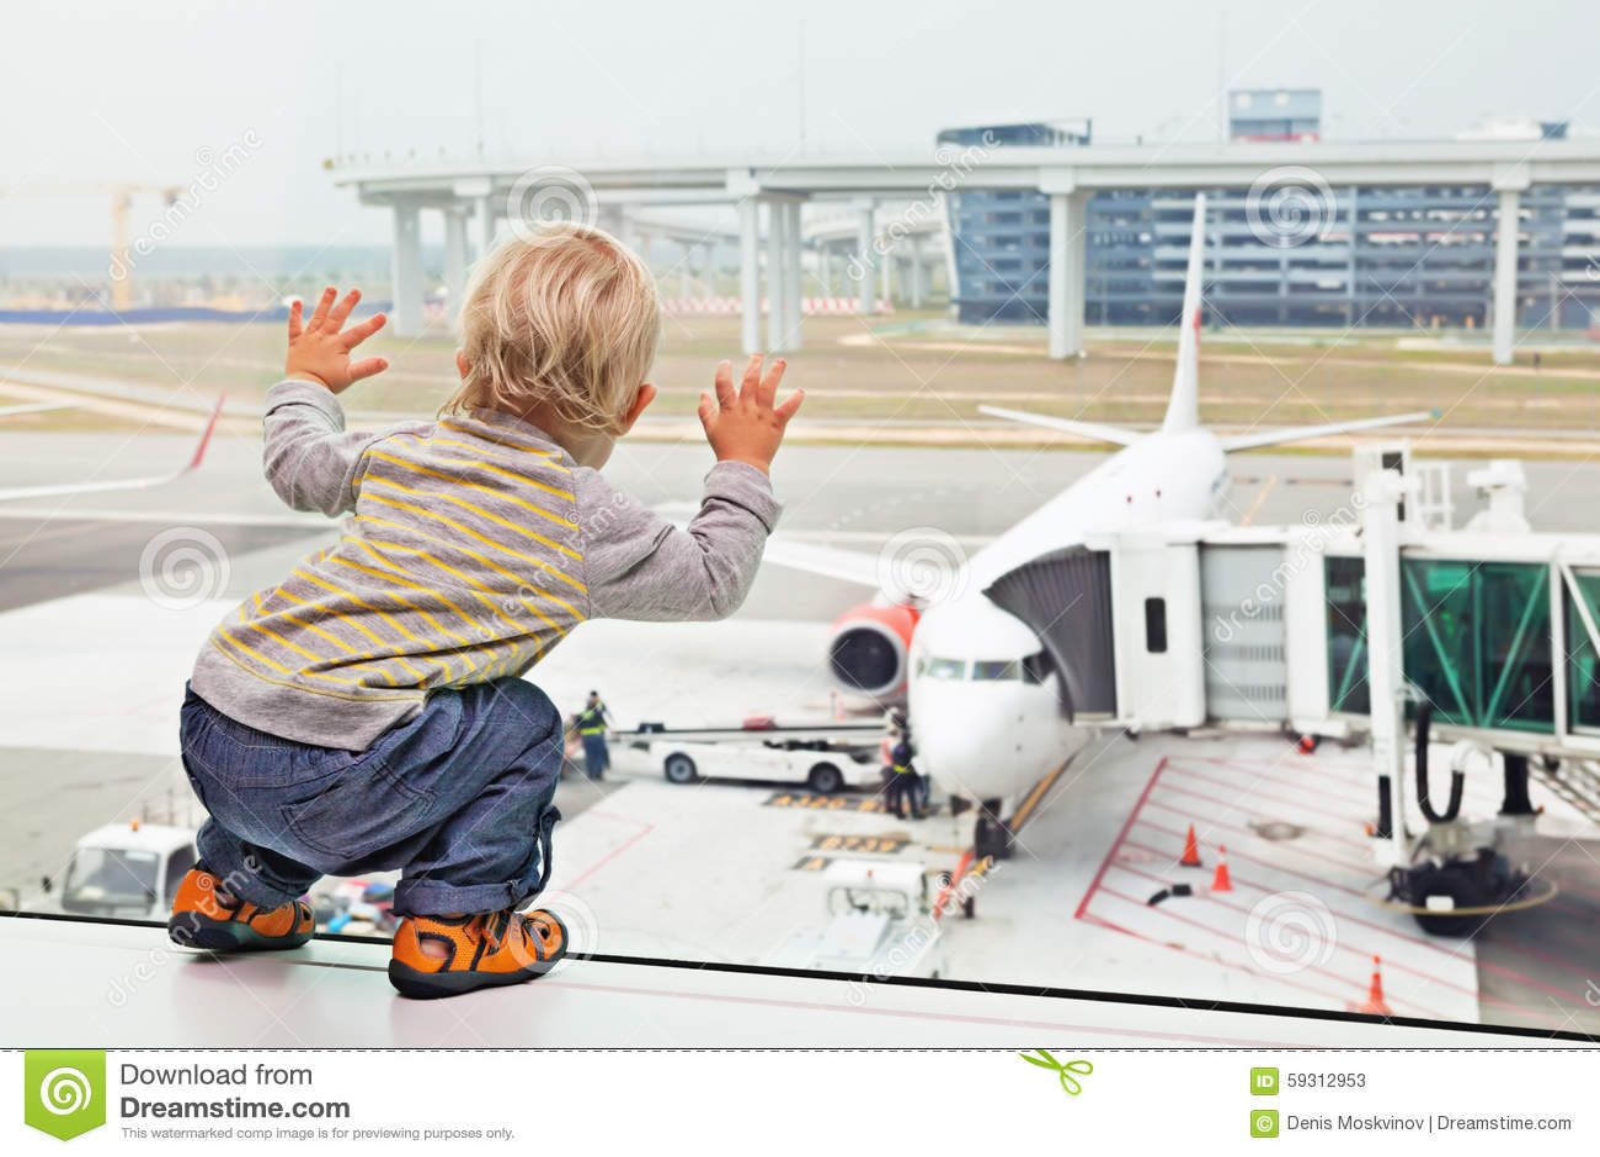 Bambino, aeroporto, viaggio, bambino, famiglia, vacanza, portone, ragazzo, aeroplano, aereo, aereo, passeggero, imbarco, partenza